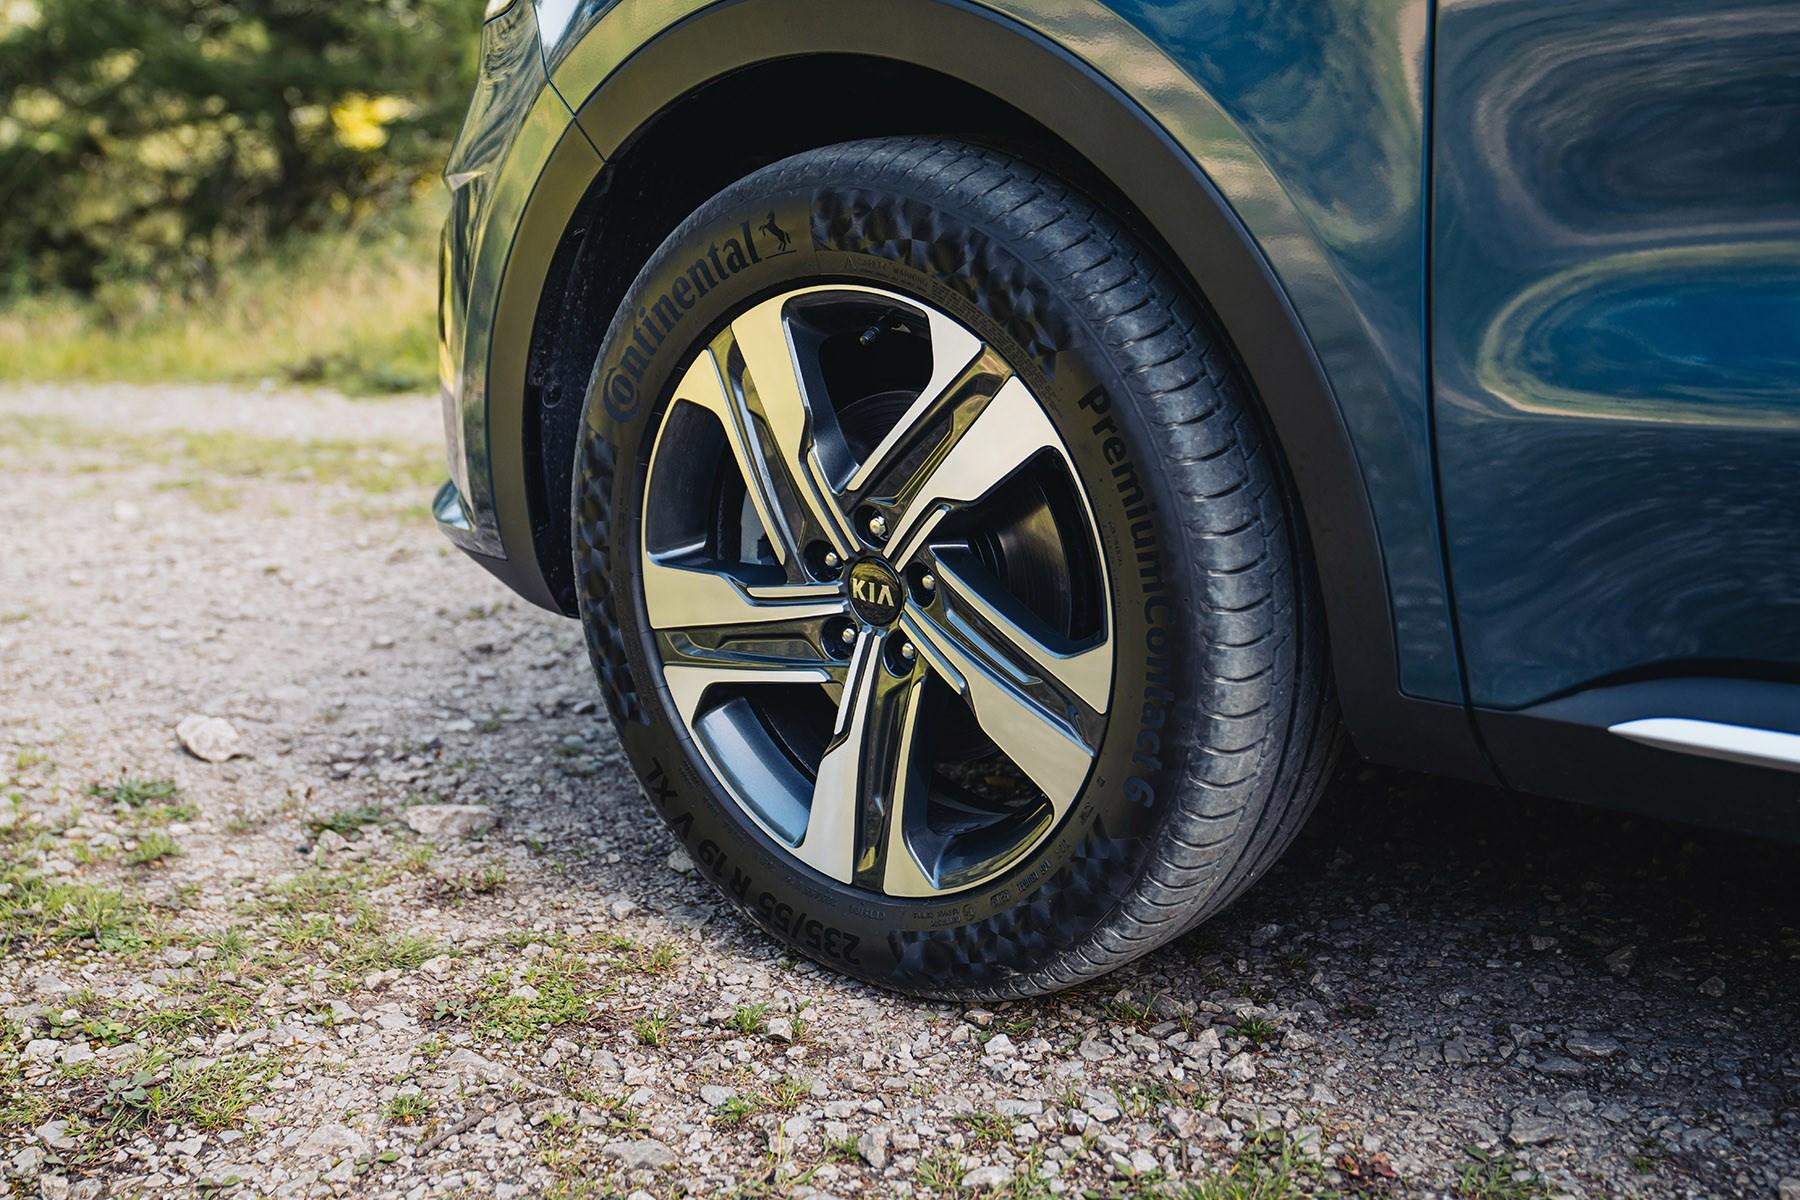 Kia Sorento 2020 19-inch wheels